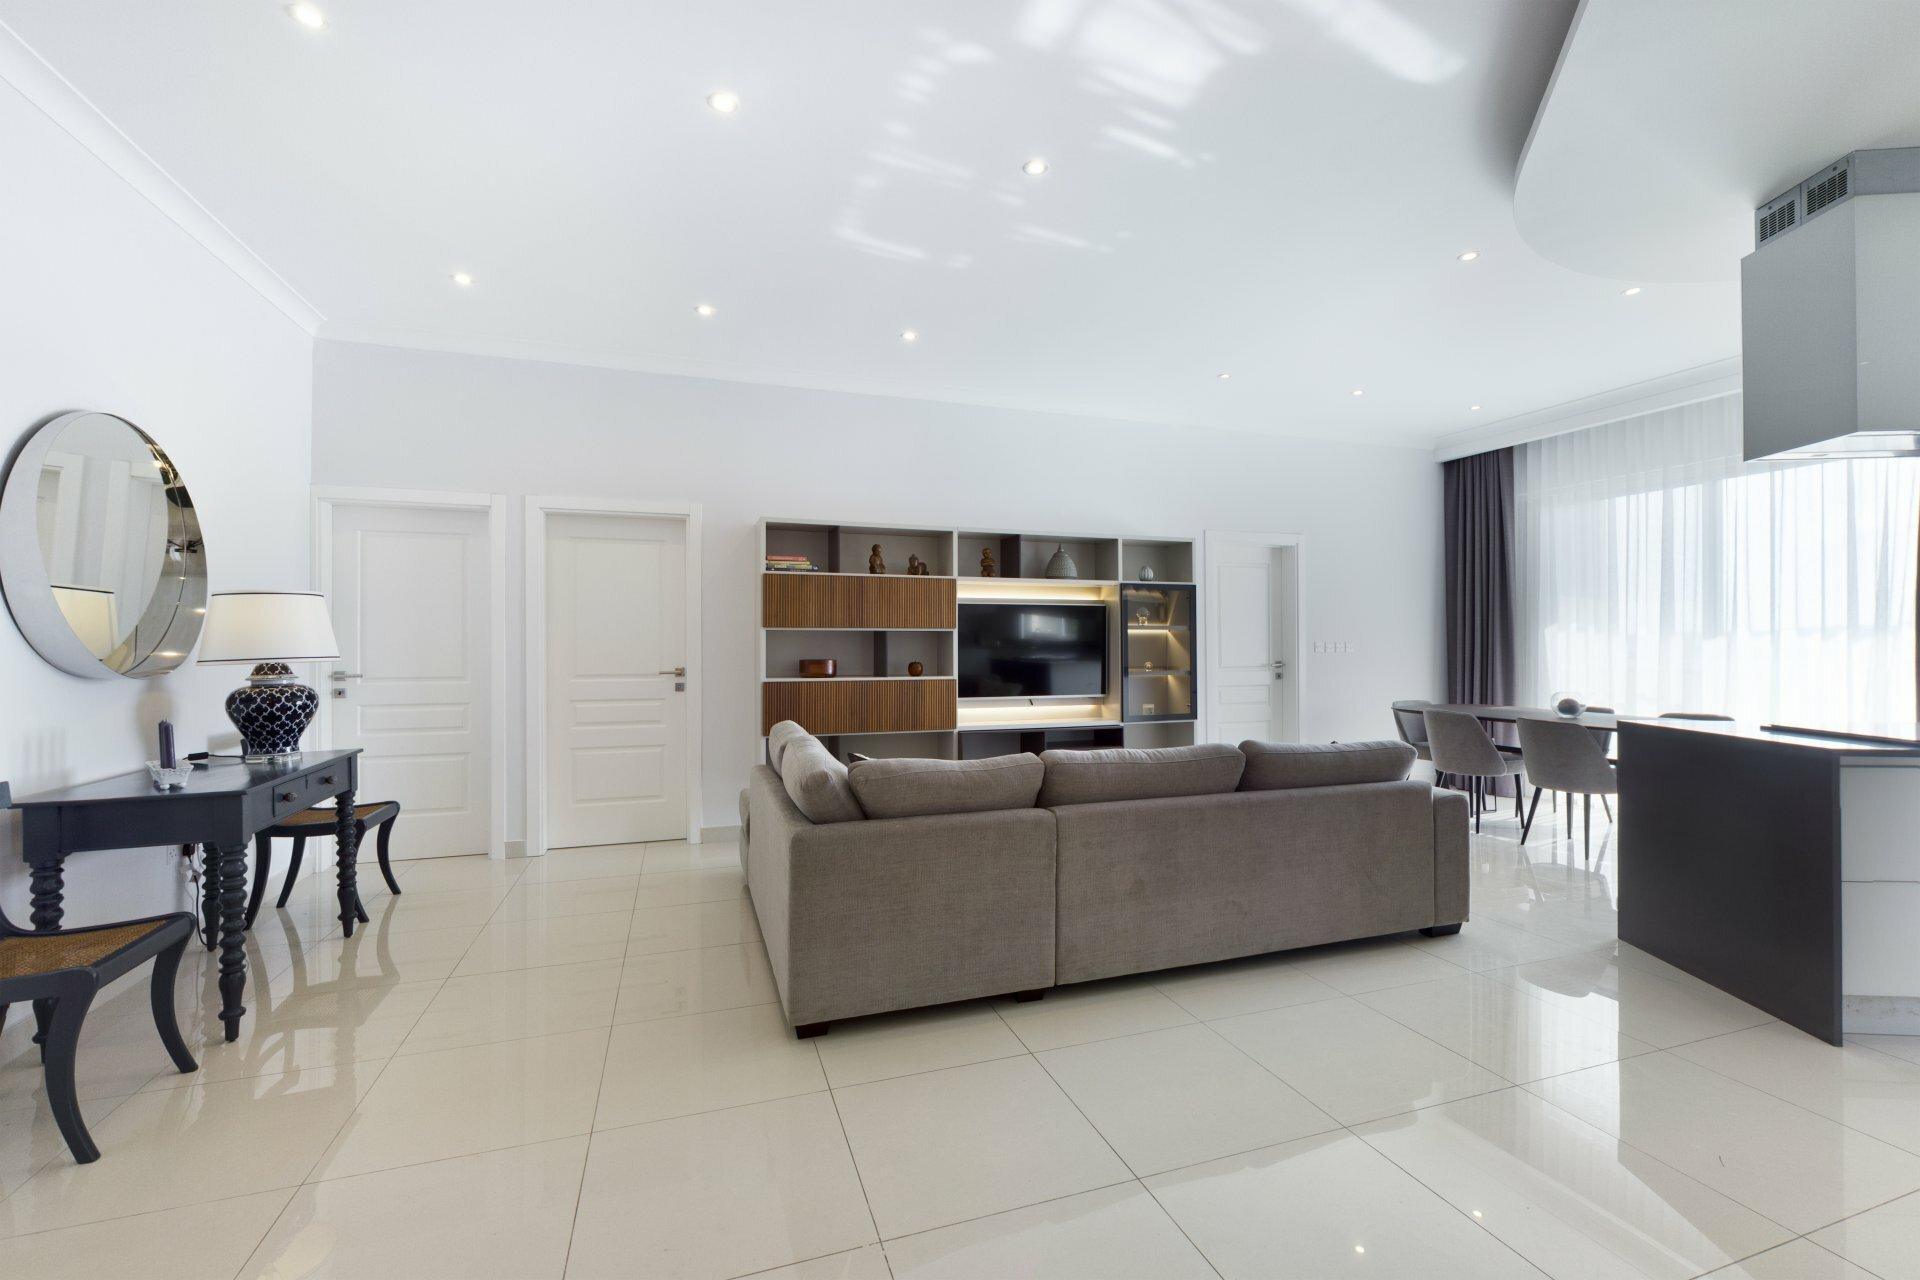 Apartment in Naxxar, Malta 1 - 11598772